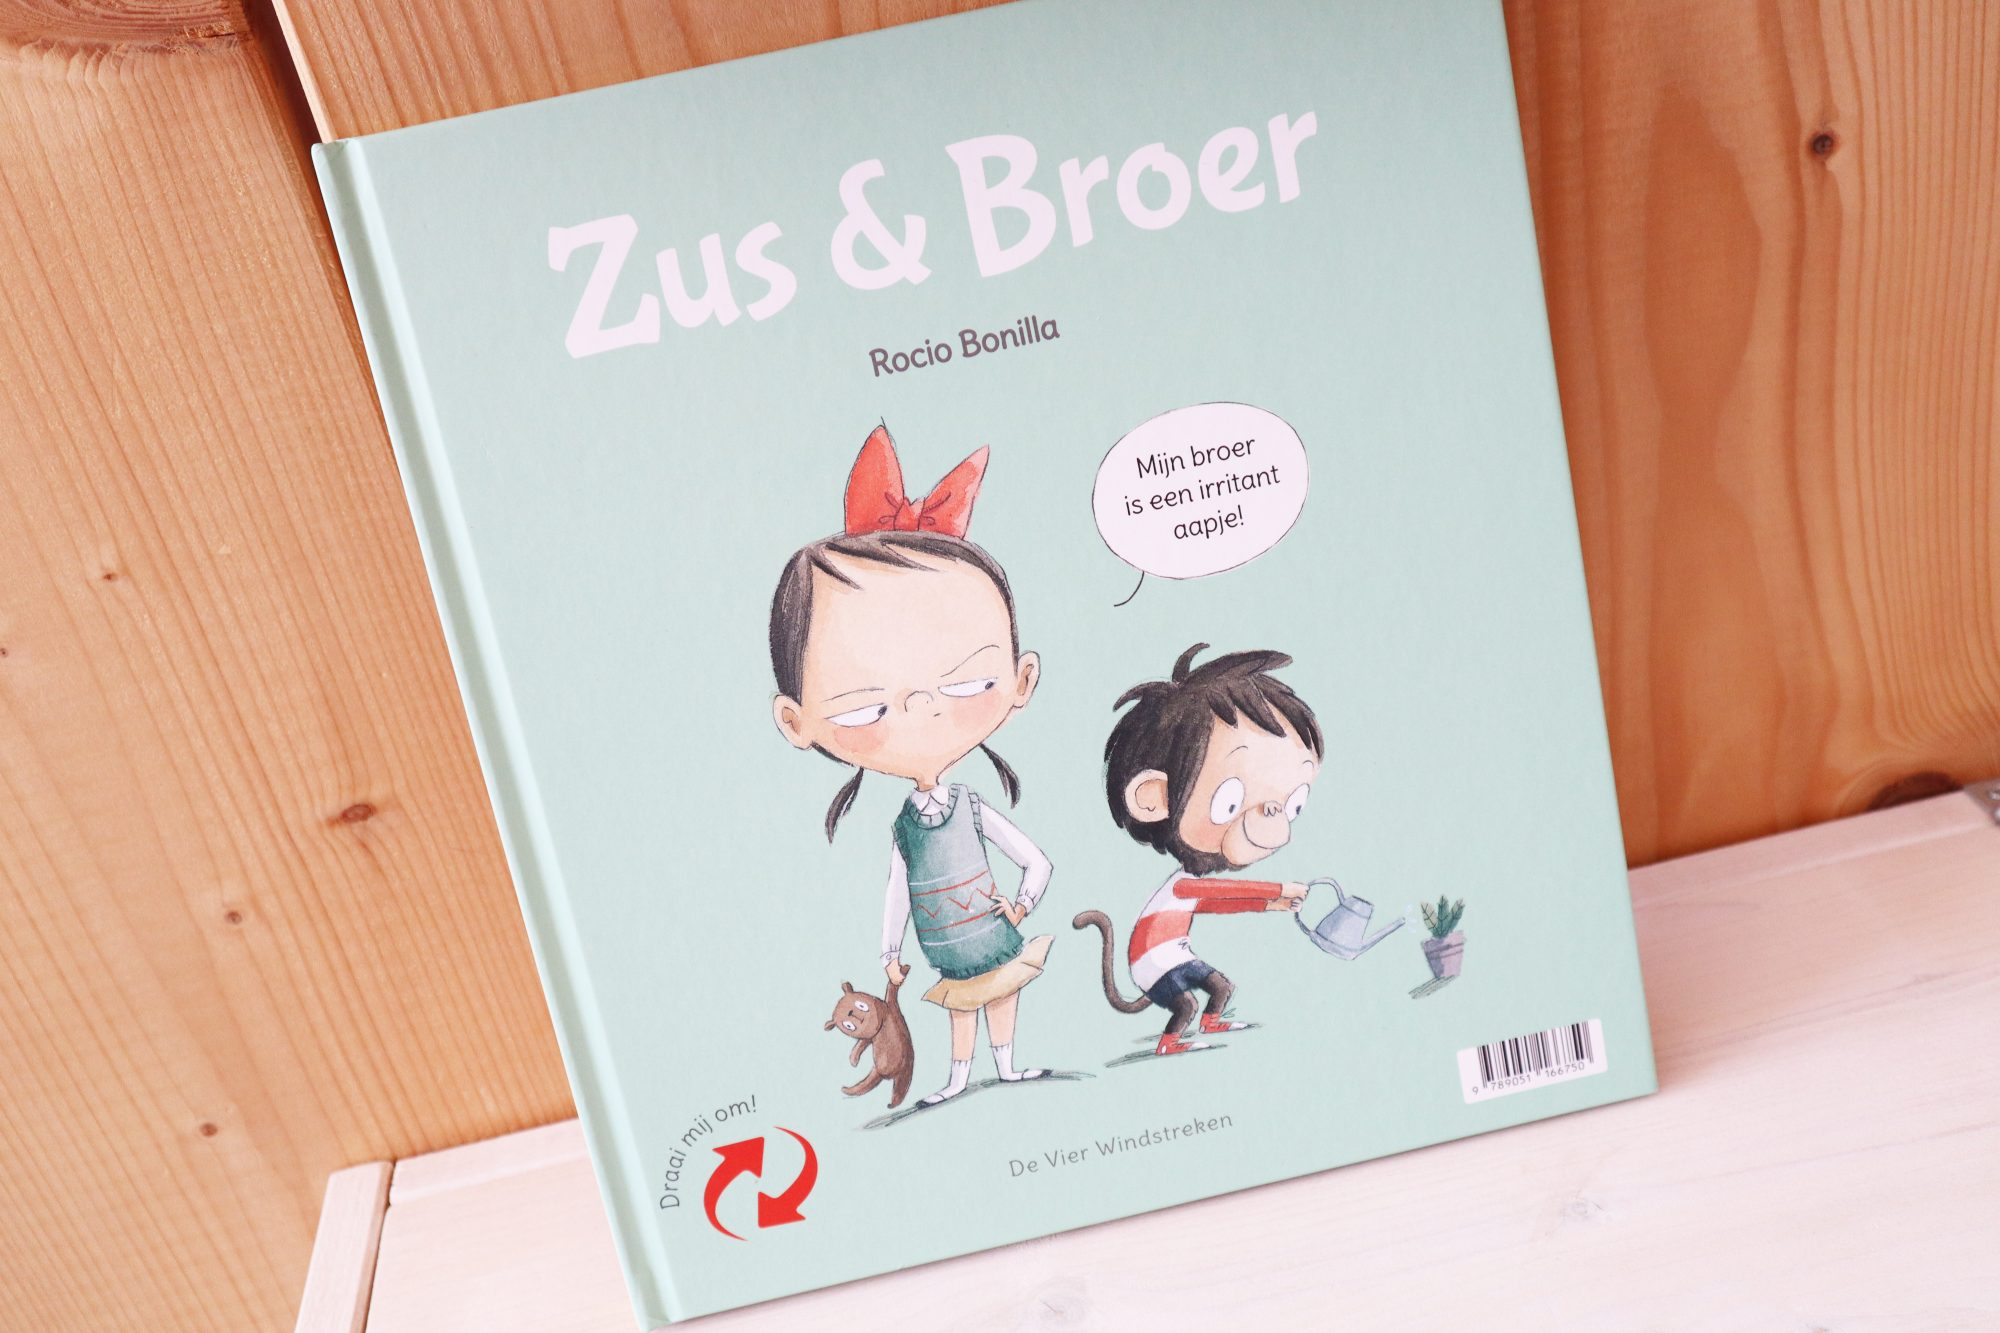 Zus & Broer